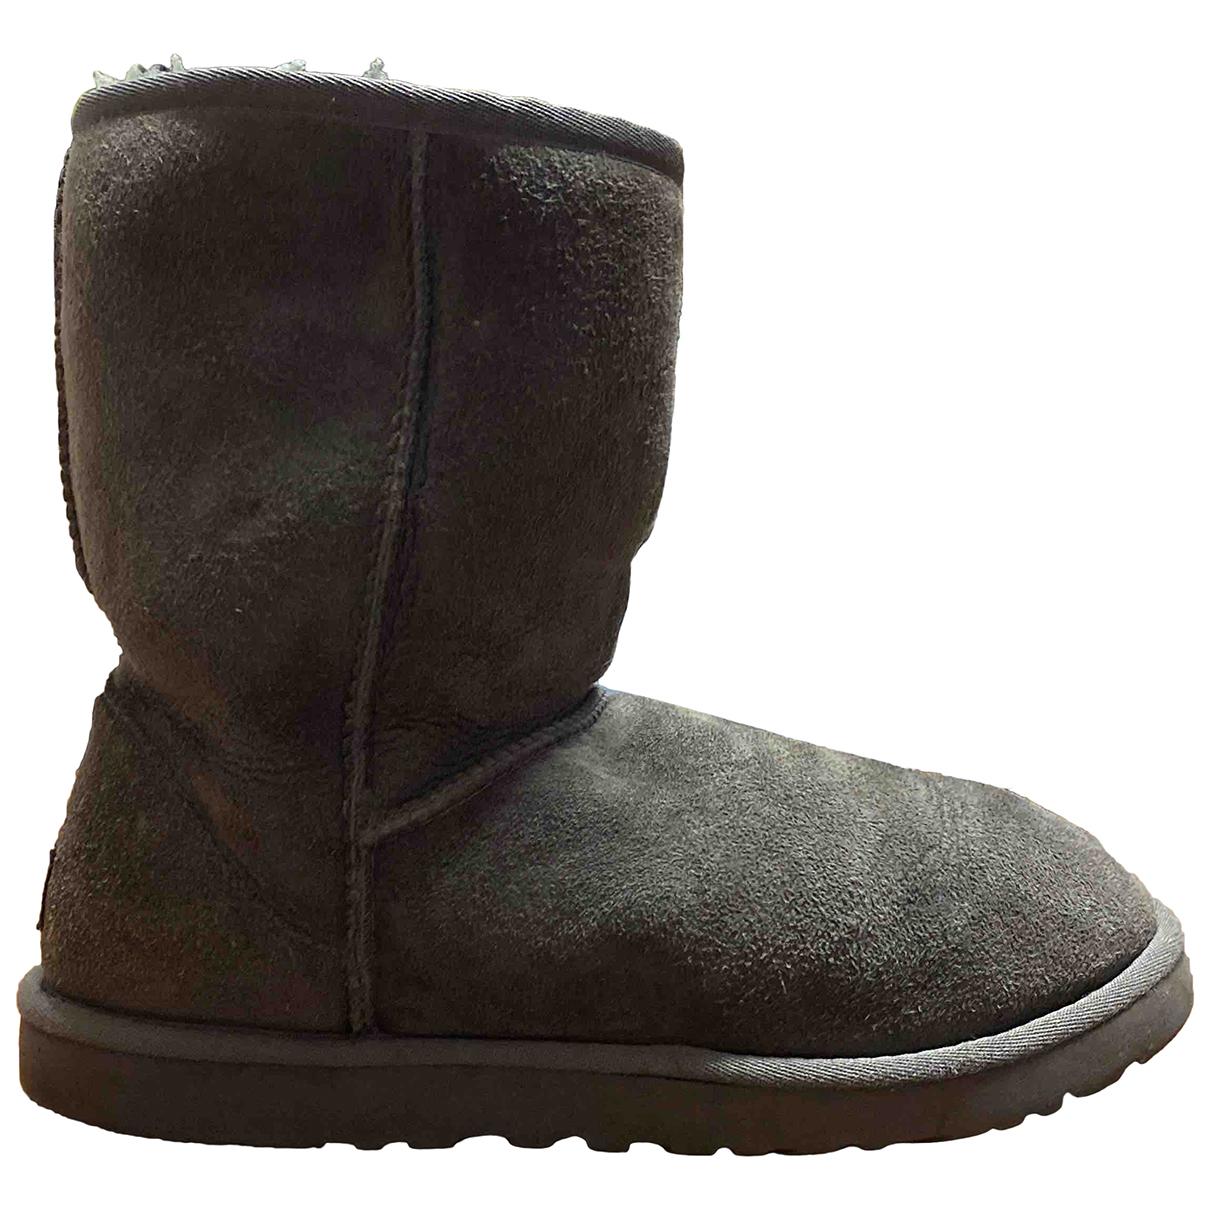 Ugg N Grey Suede Boots for Women 38 EU